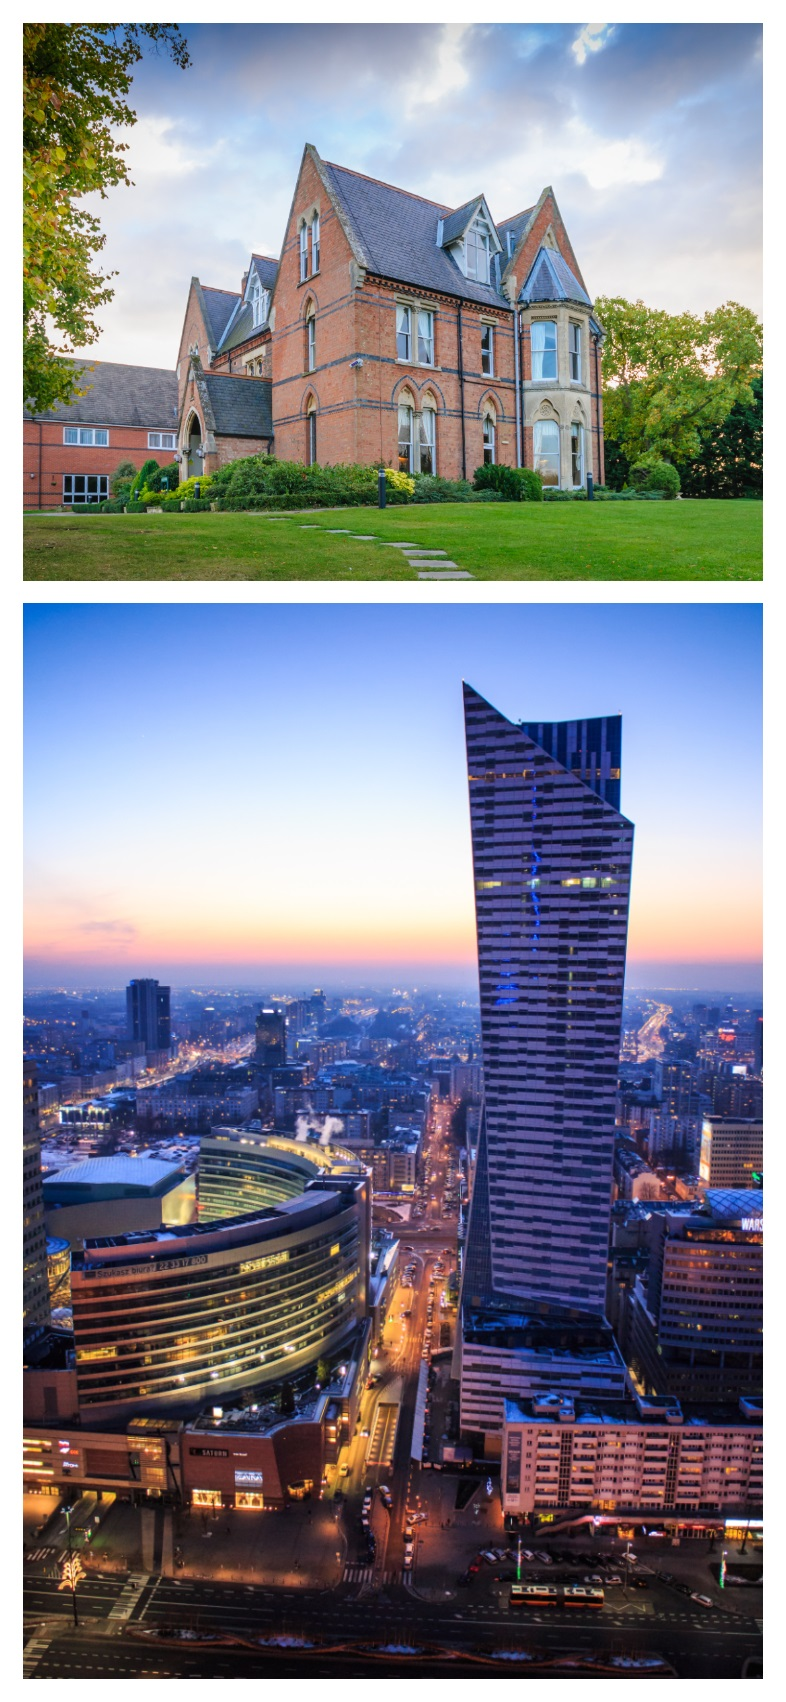 Property Architectural Photography Warwickshire Birmingham Midlands London UK 8